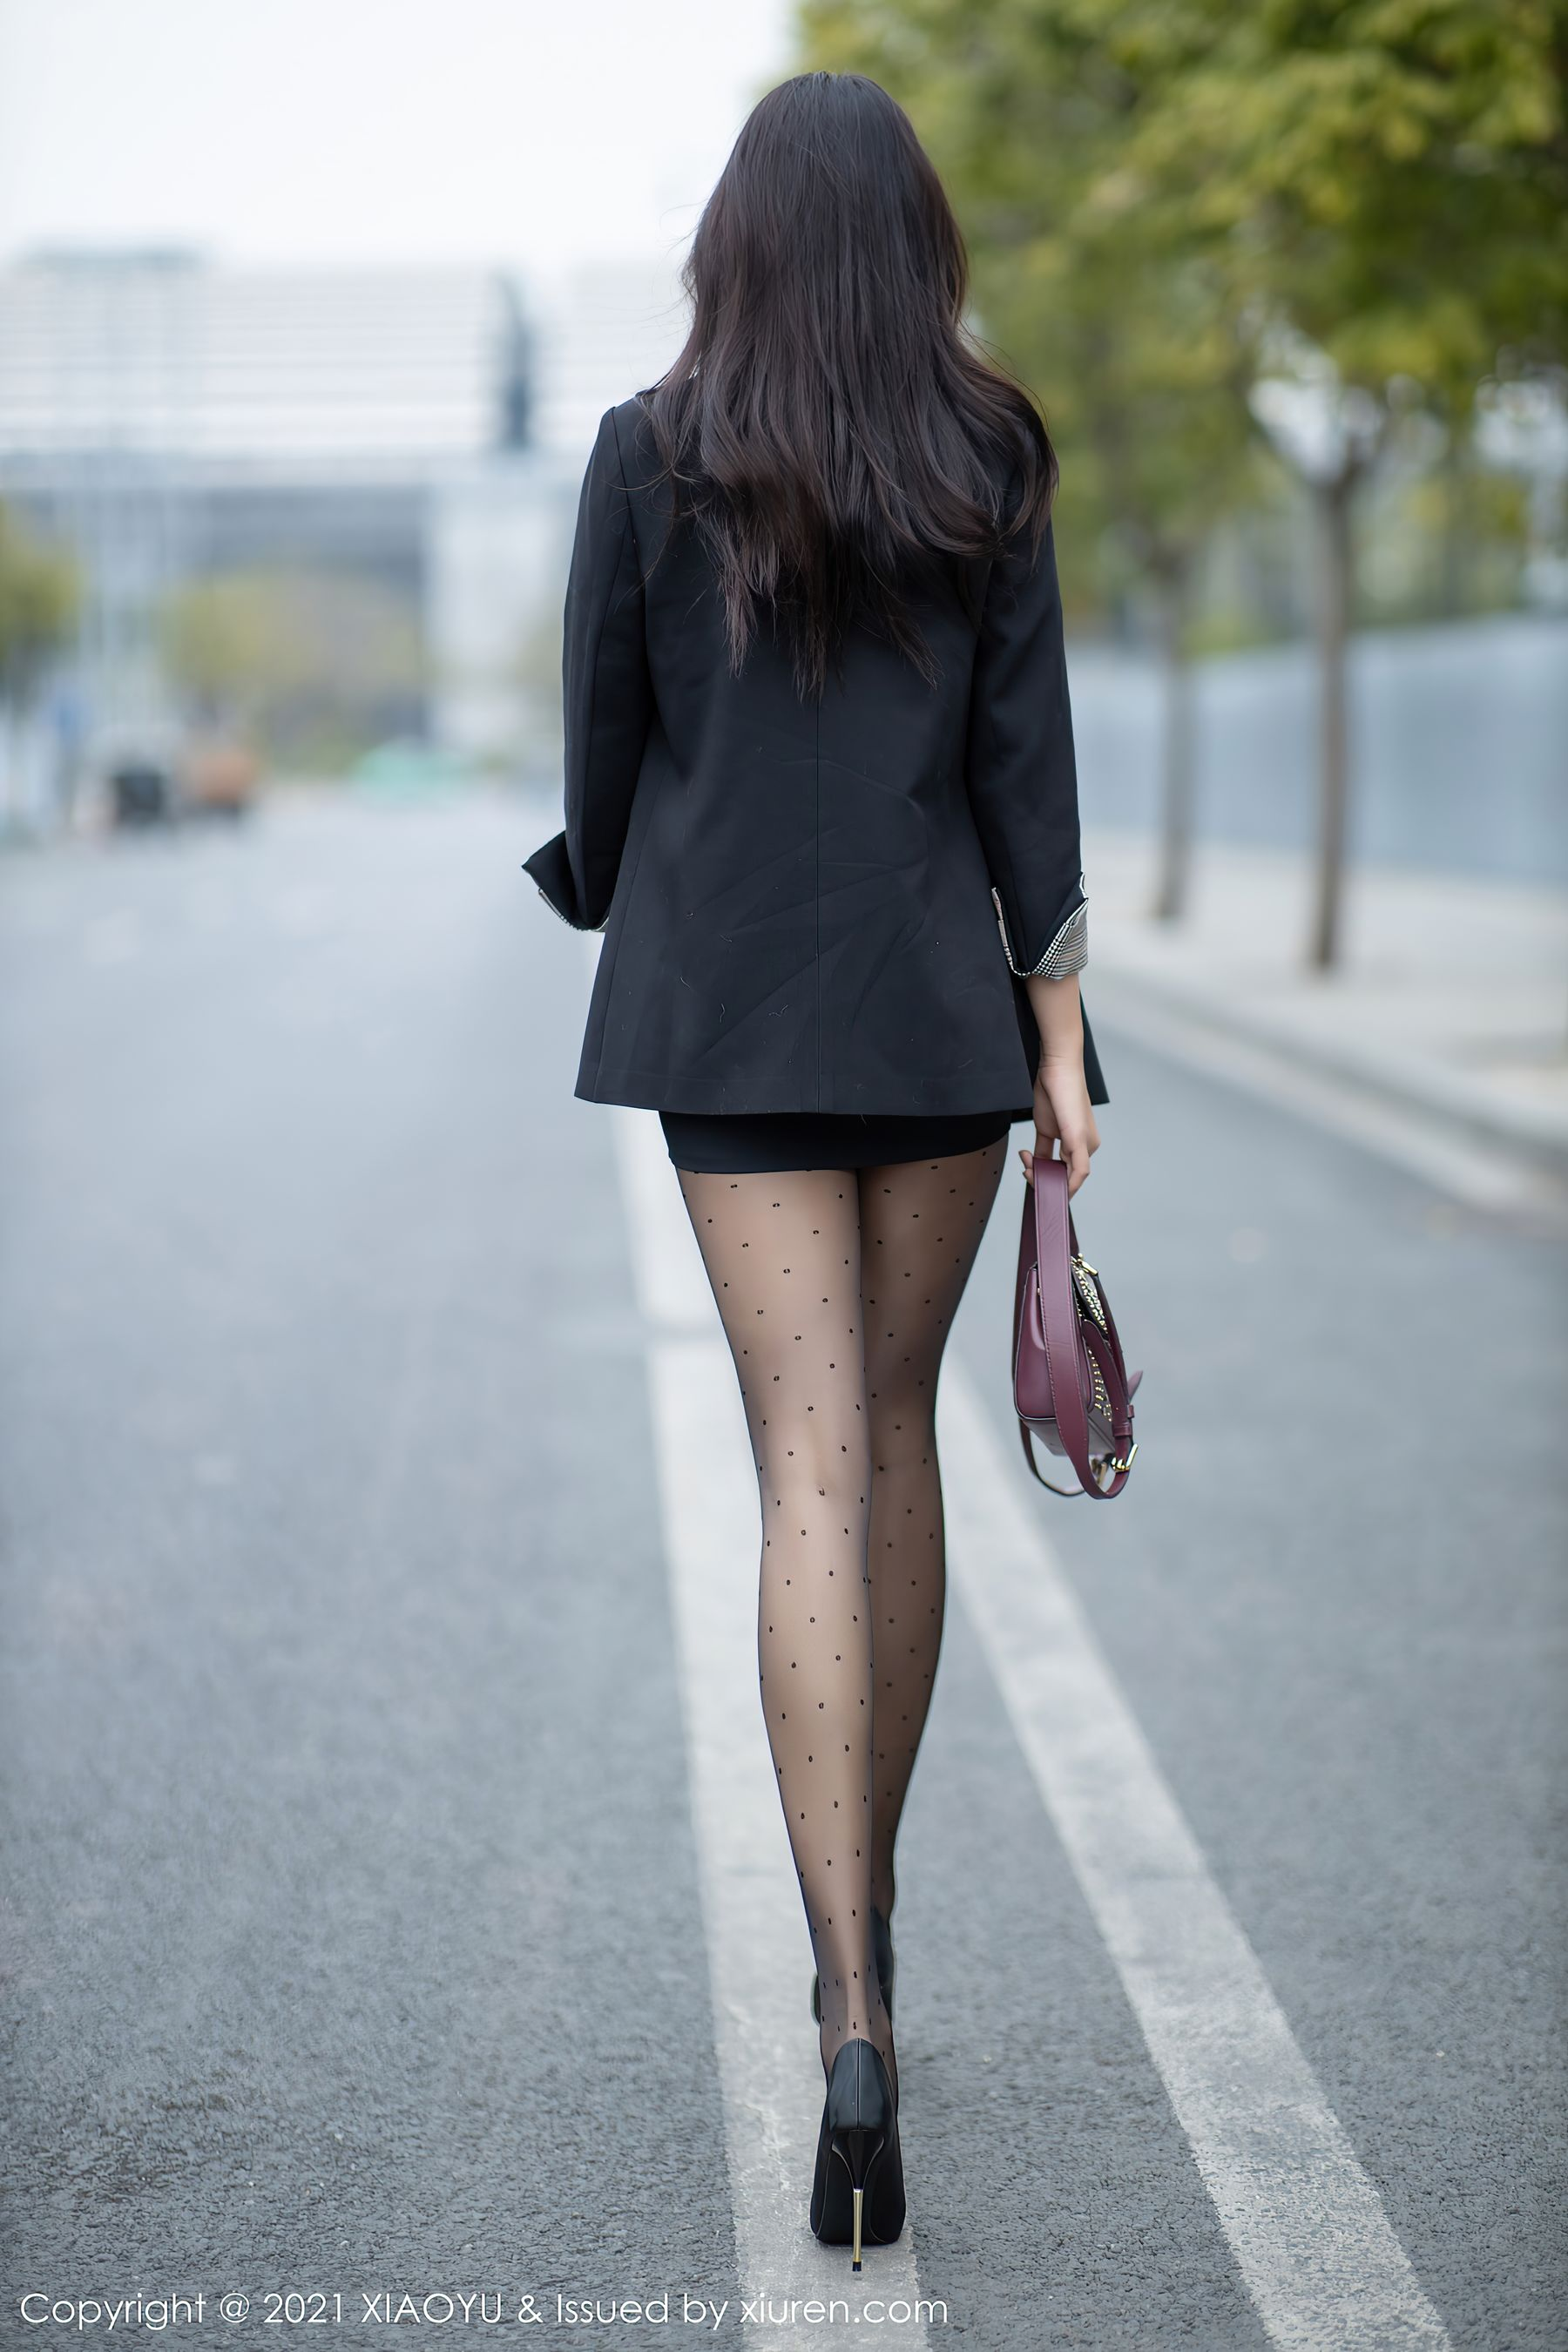 VOL.594 [语画界]街拍黑丝街拍美腿白领丽人:小娜比(模特小娜比)超高清写真套图(80P)